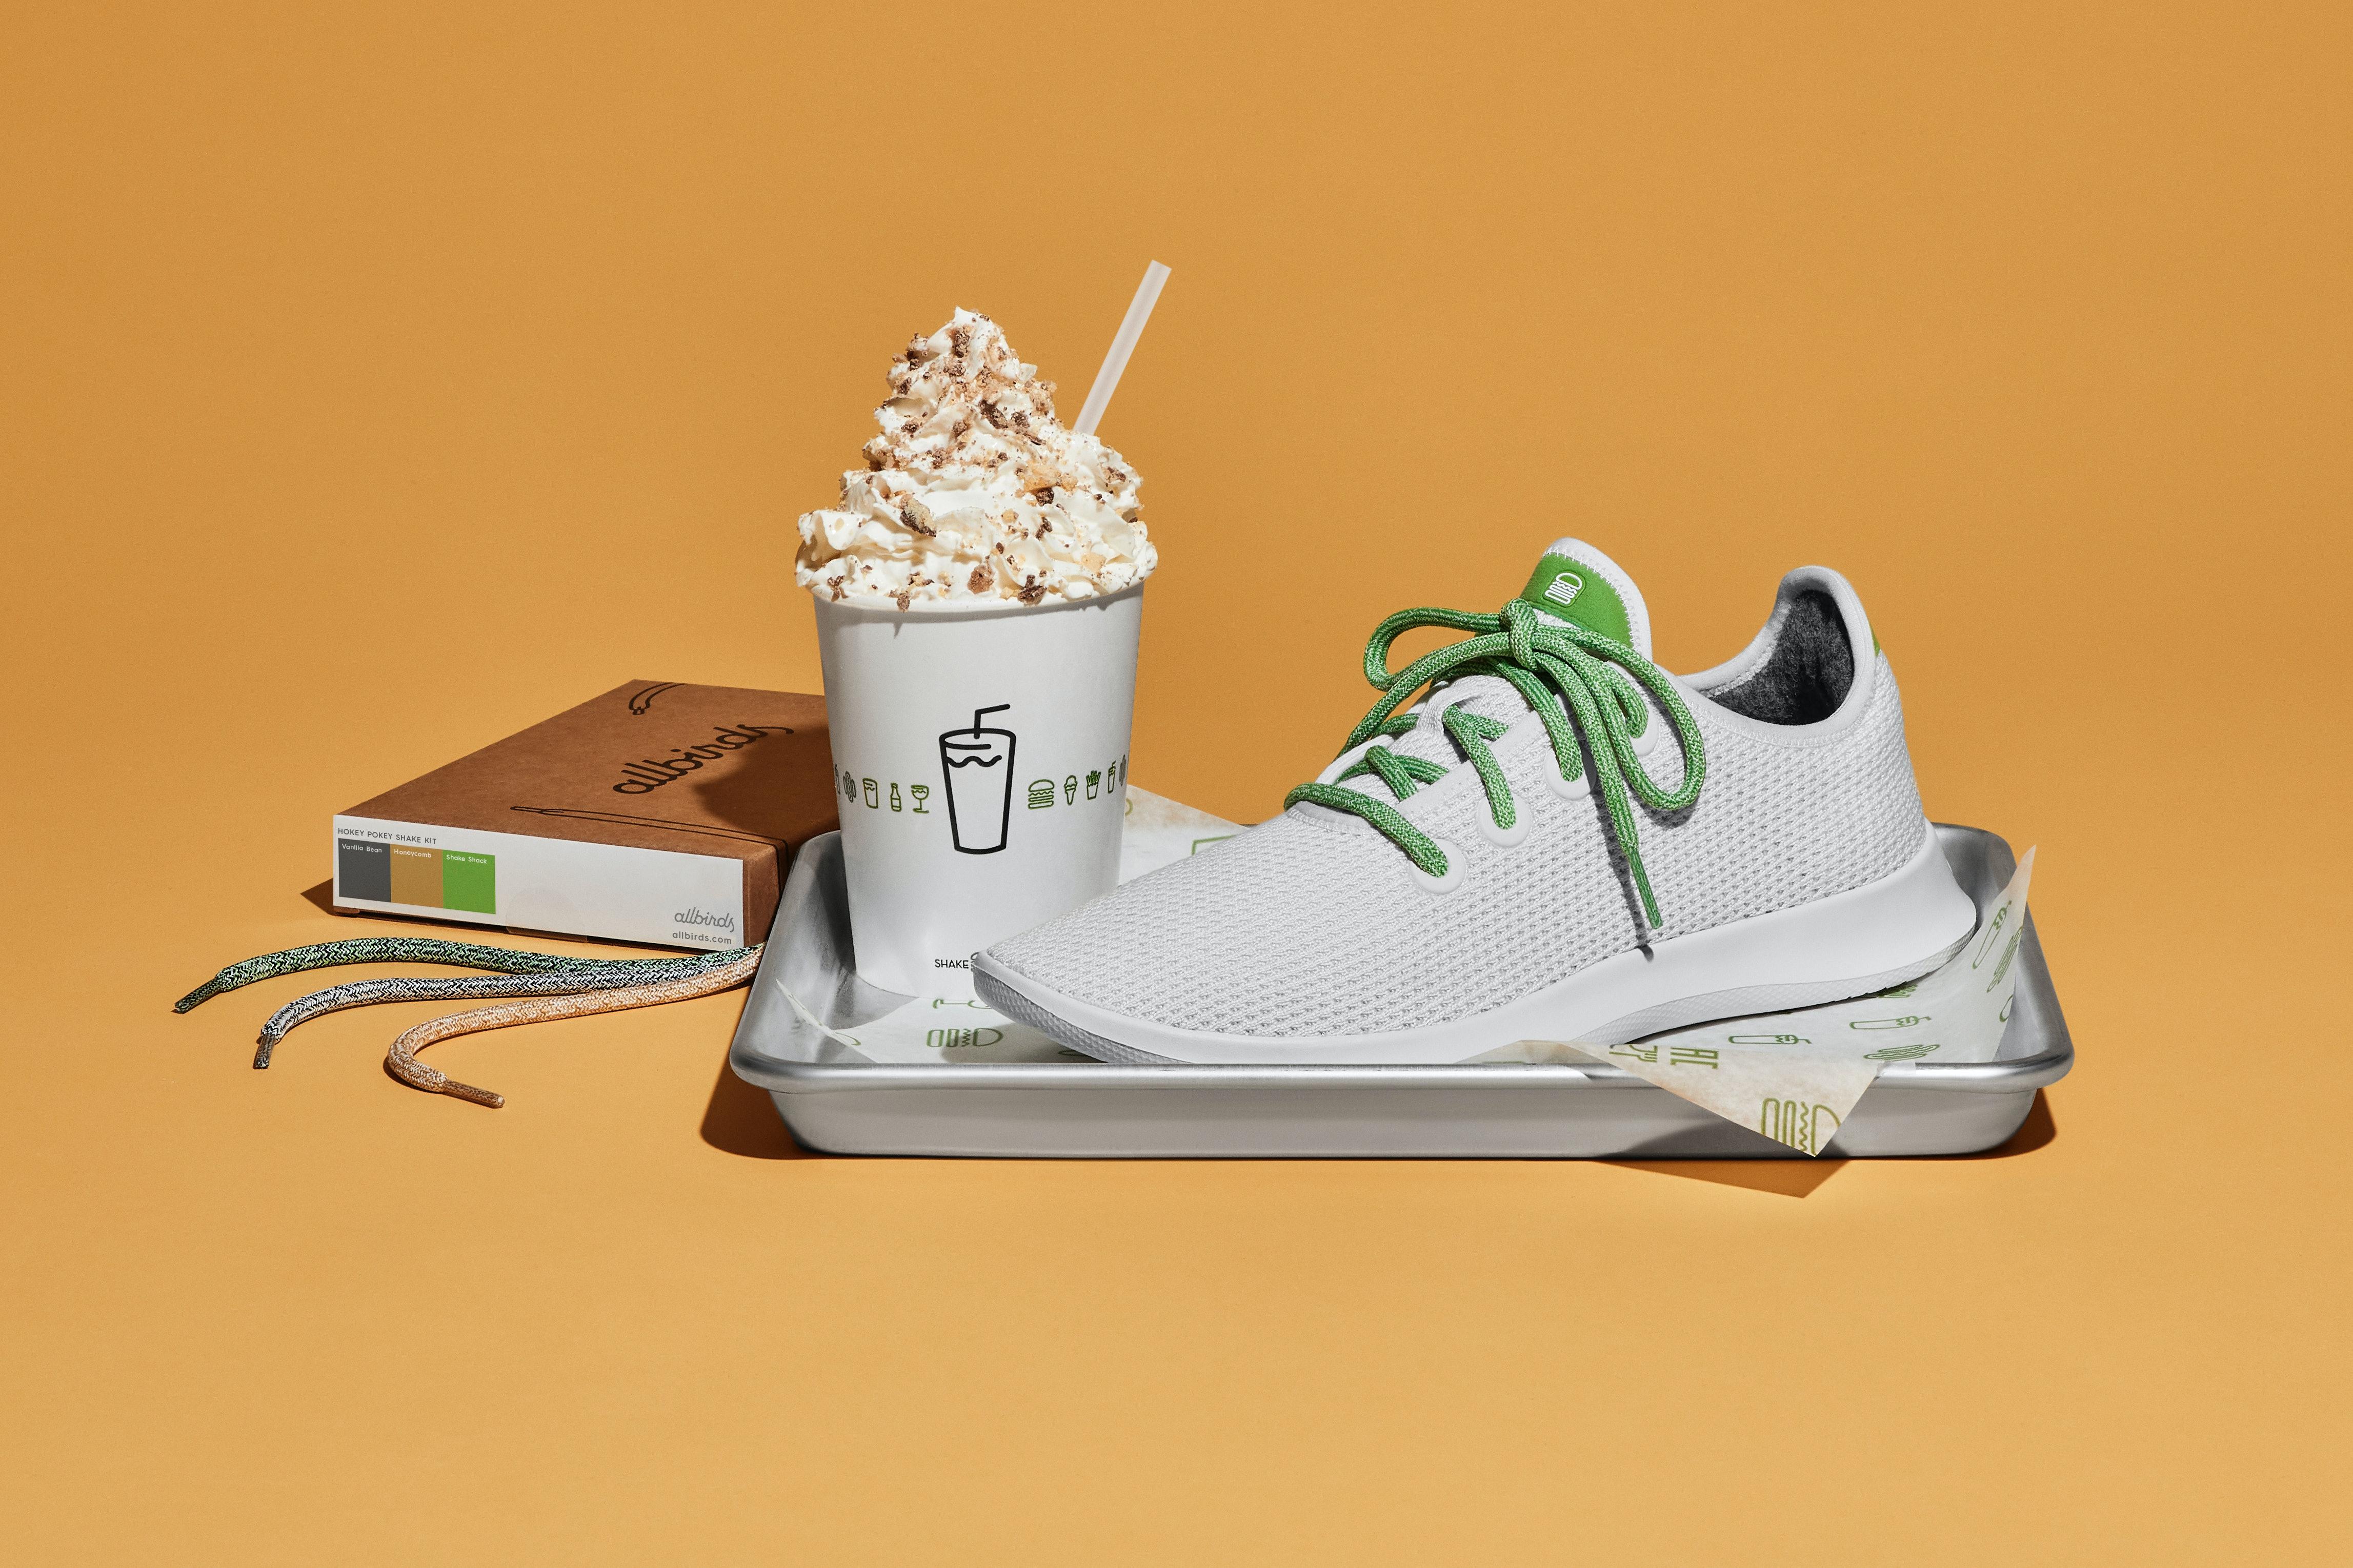 Allbirds x Shake Shack Sneakers Are